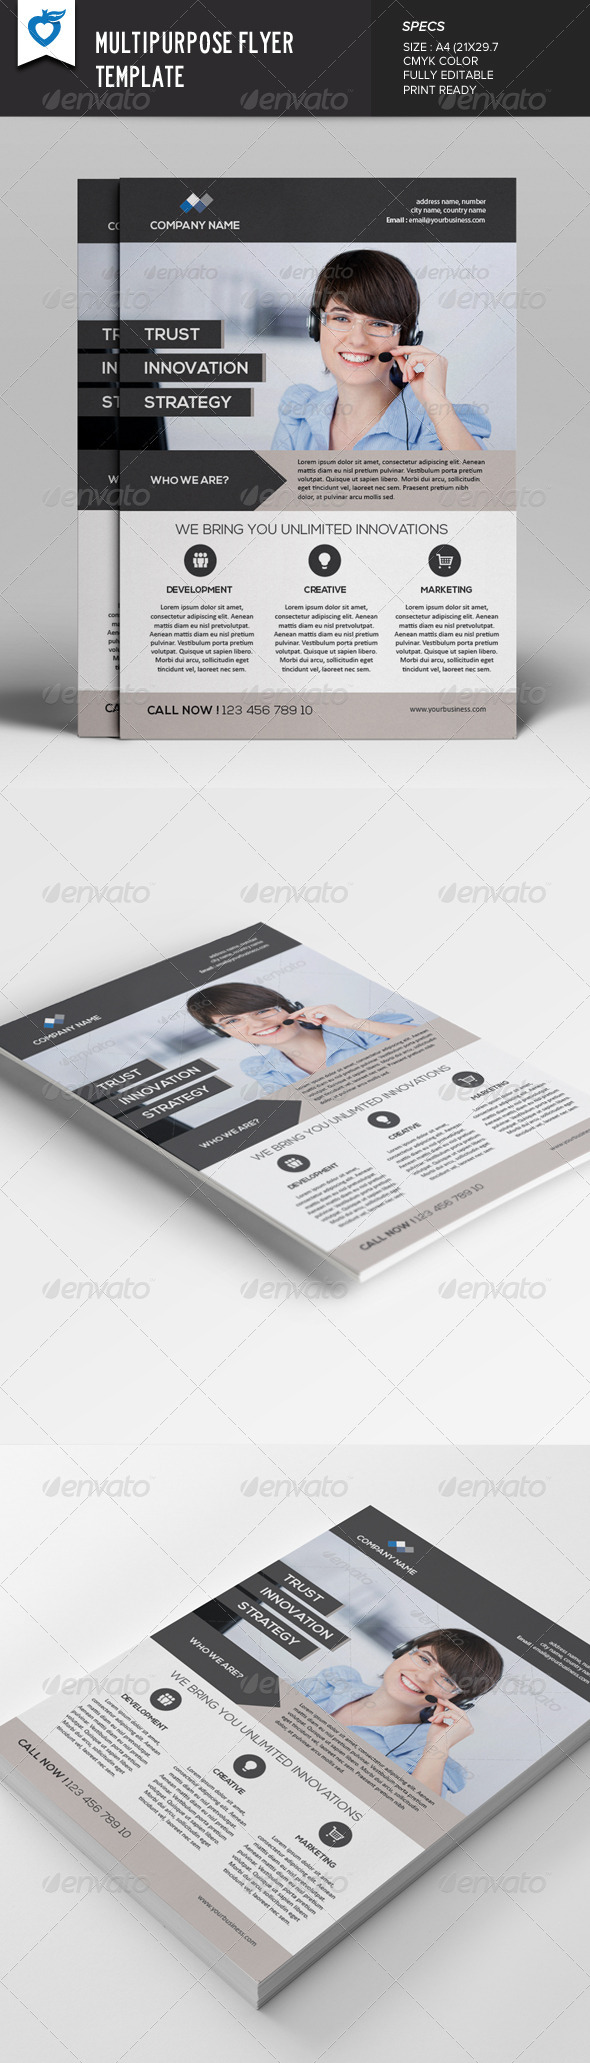 GraphicRiver Multipurpose Flyer Template 7907392